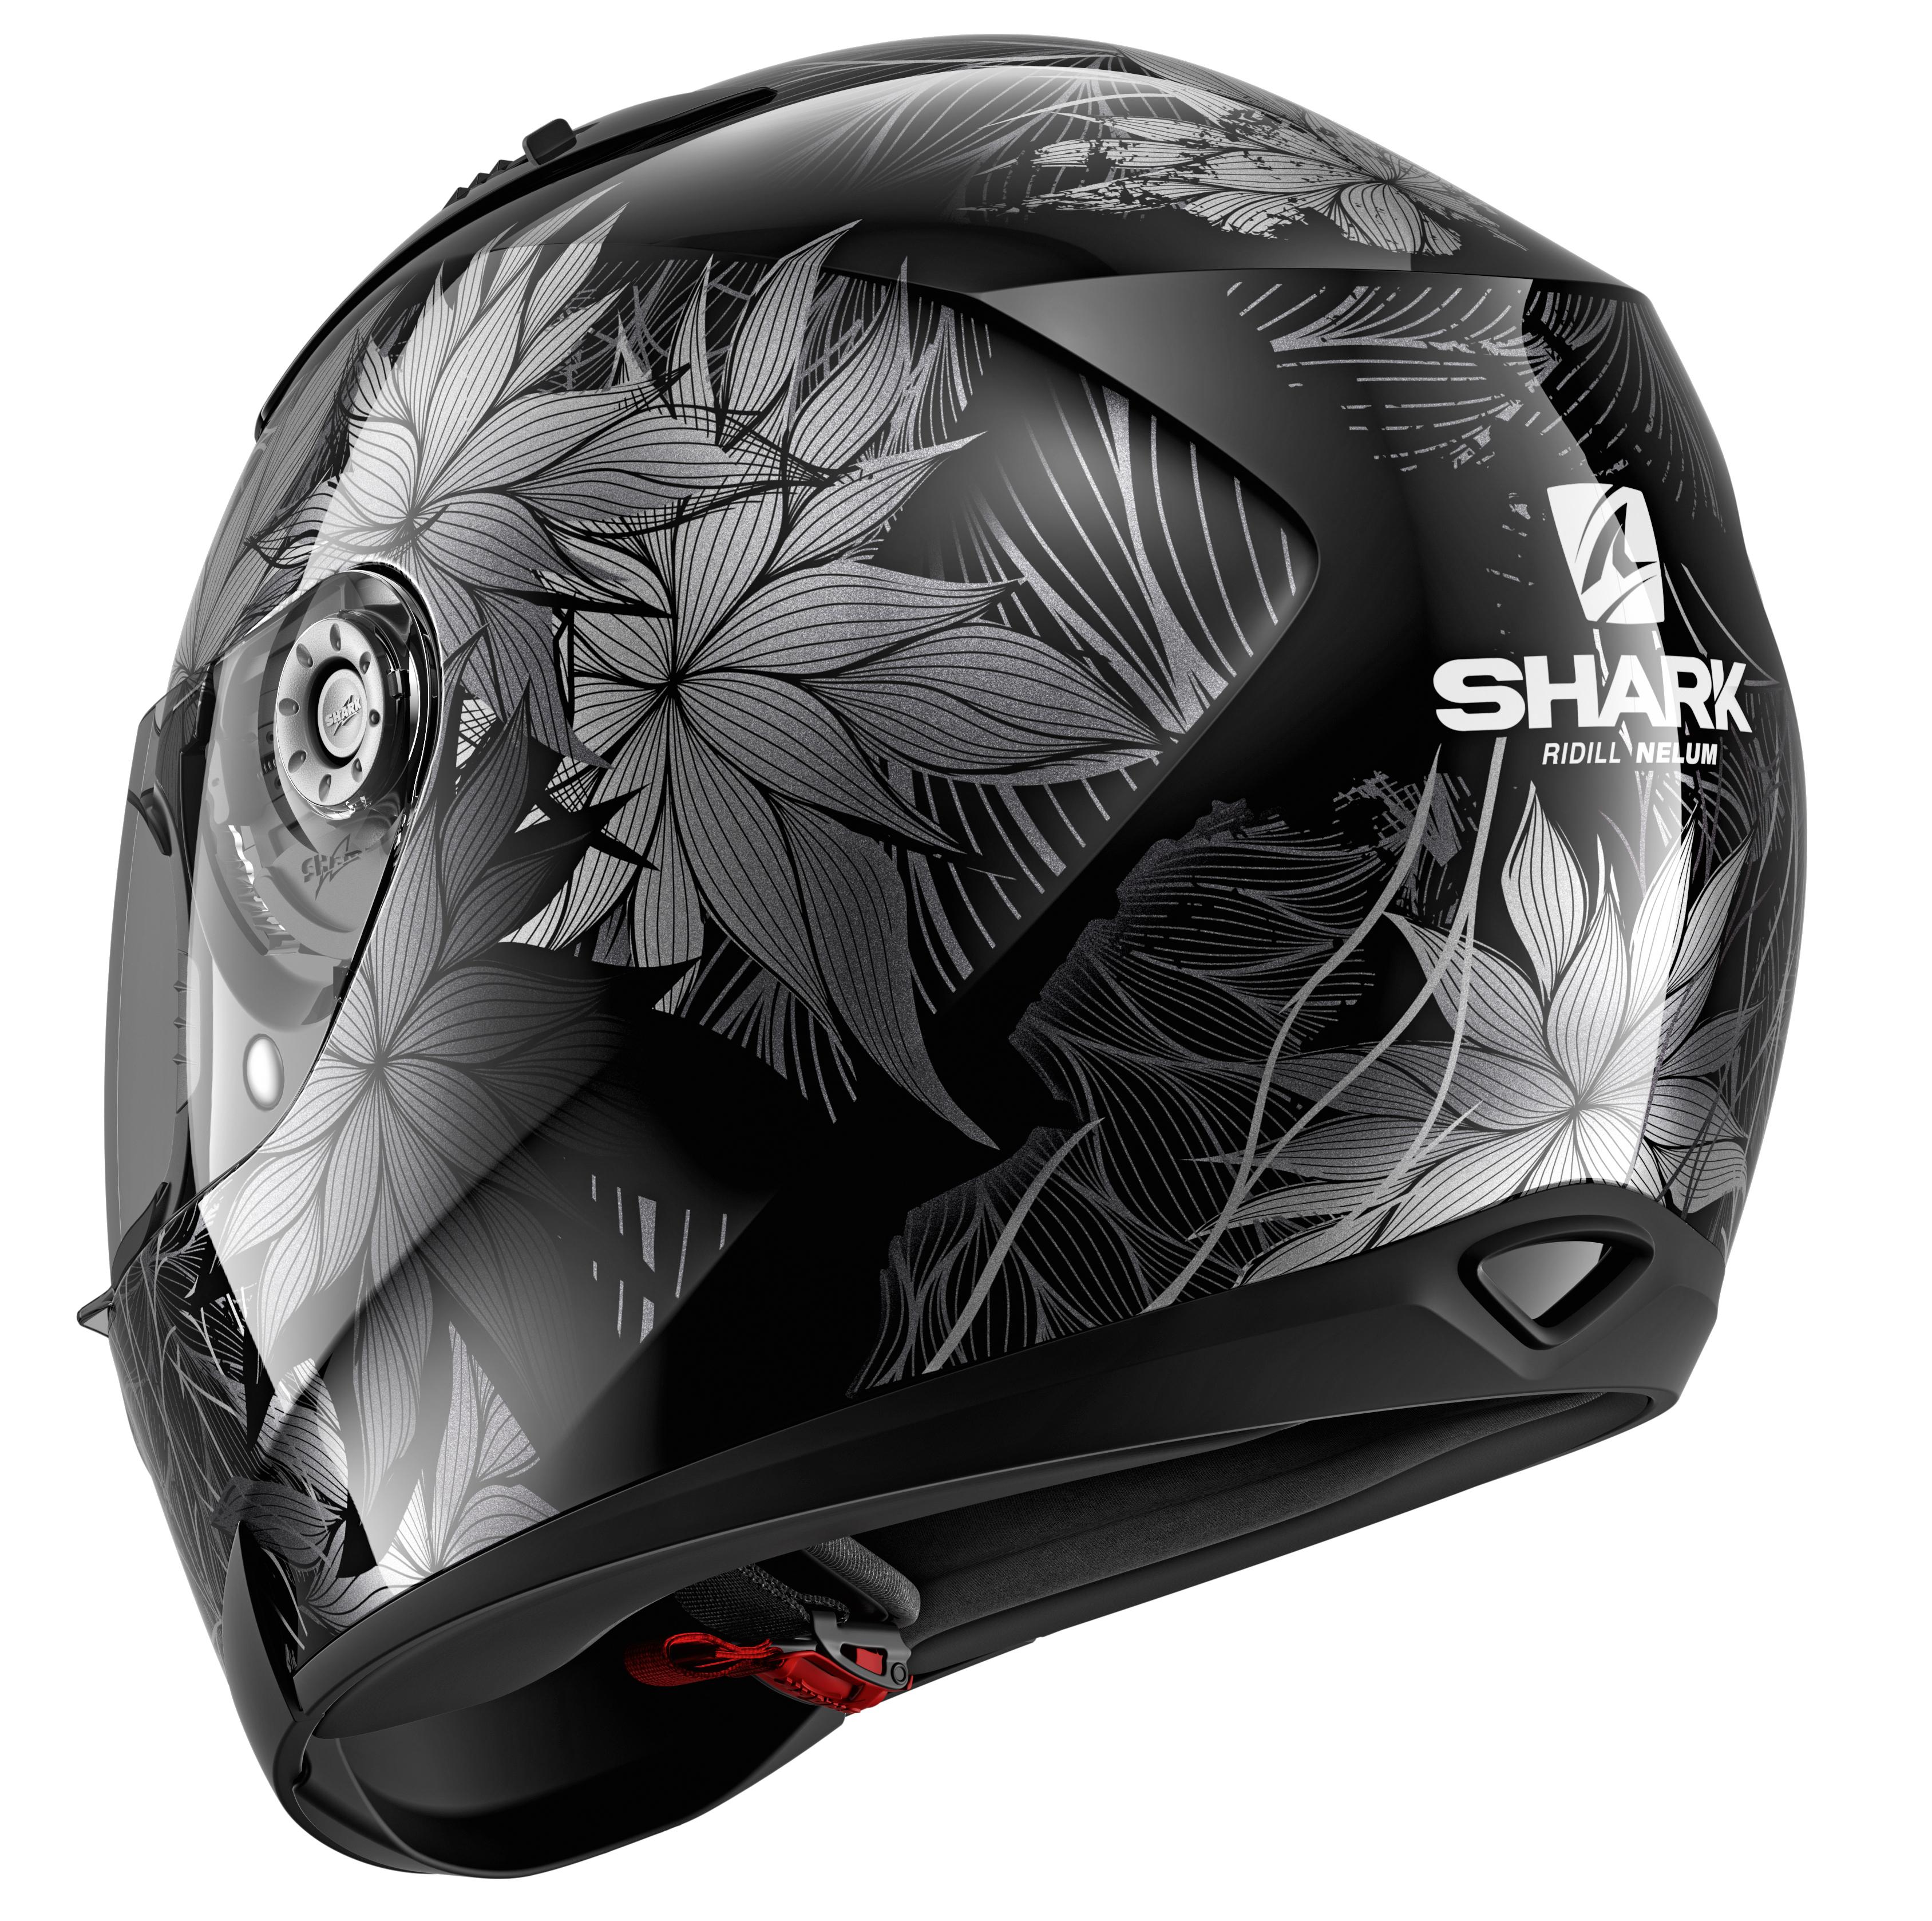 Motorcycle helmets Shark RIDILL 1.2 NELUM KSA Black//Anthracite M